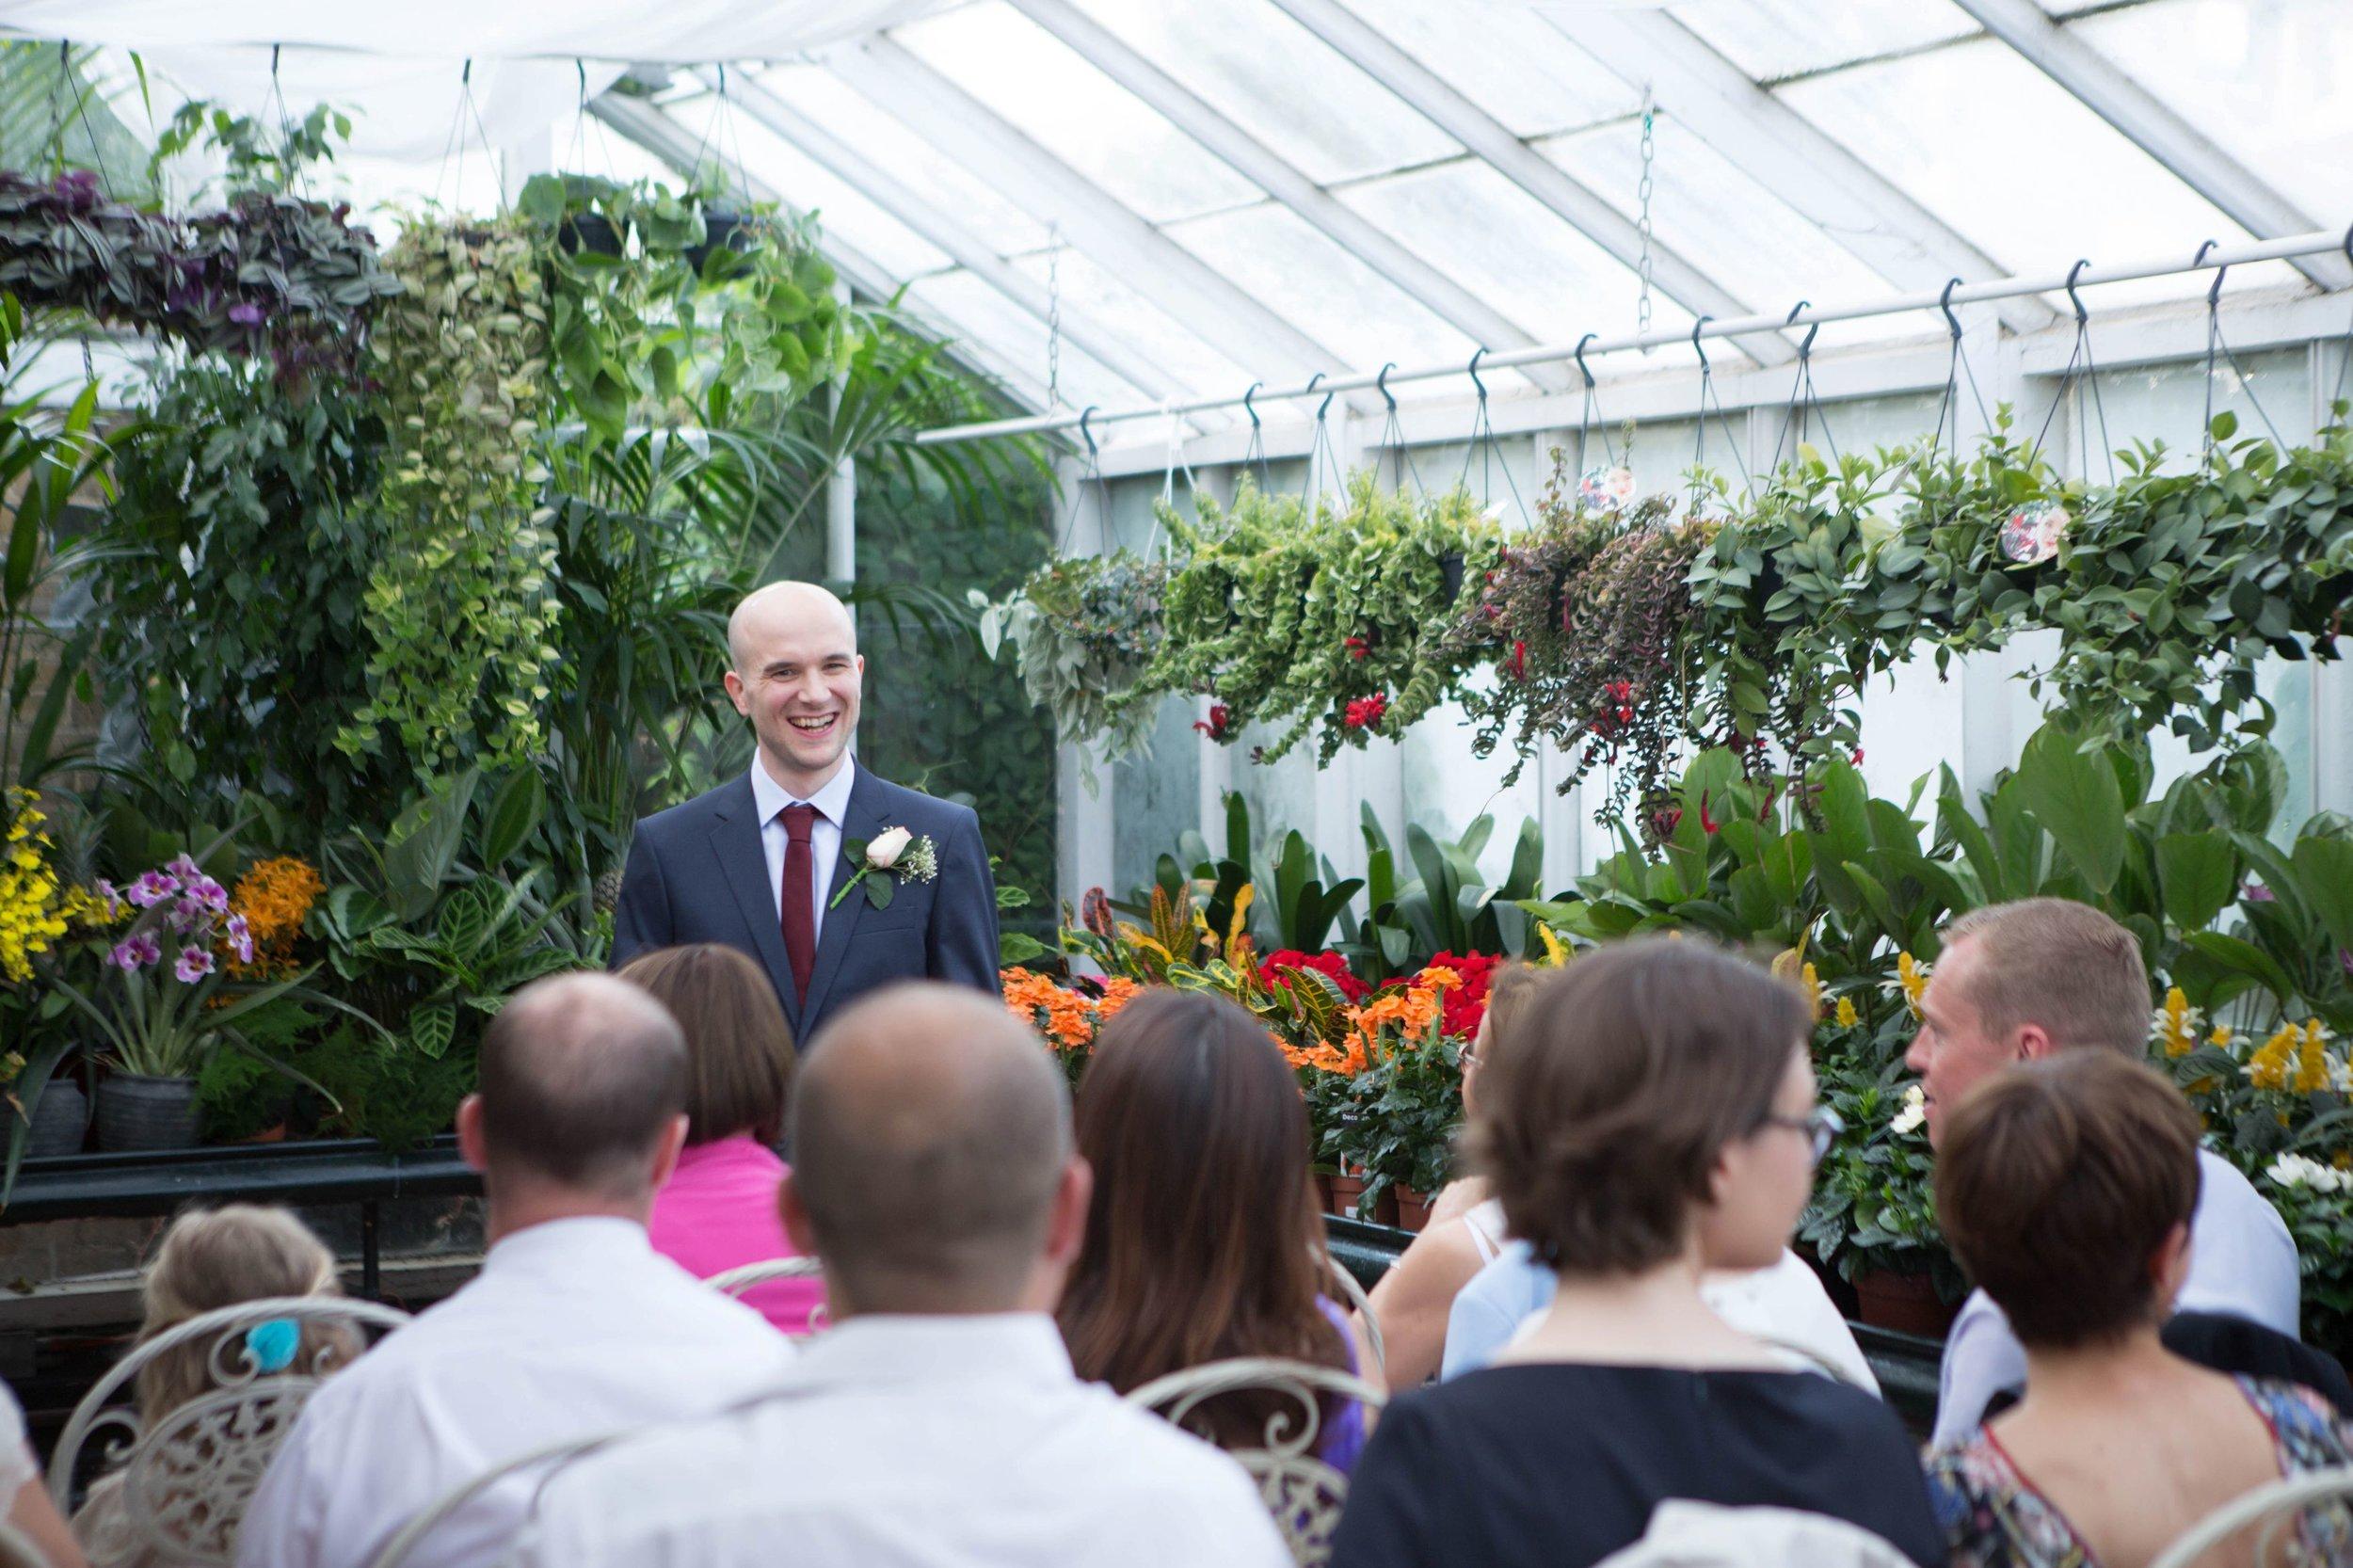 Hulya_&_Ben's_Clifton_Nurseries_London_Wedding_0115.jpg